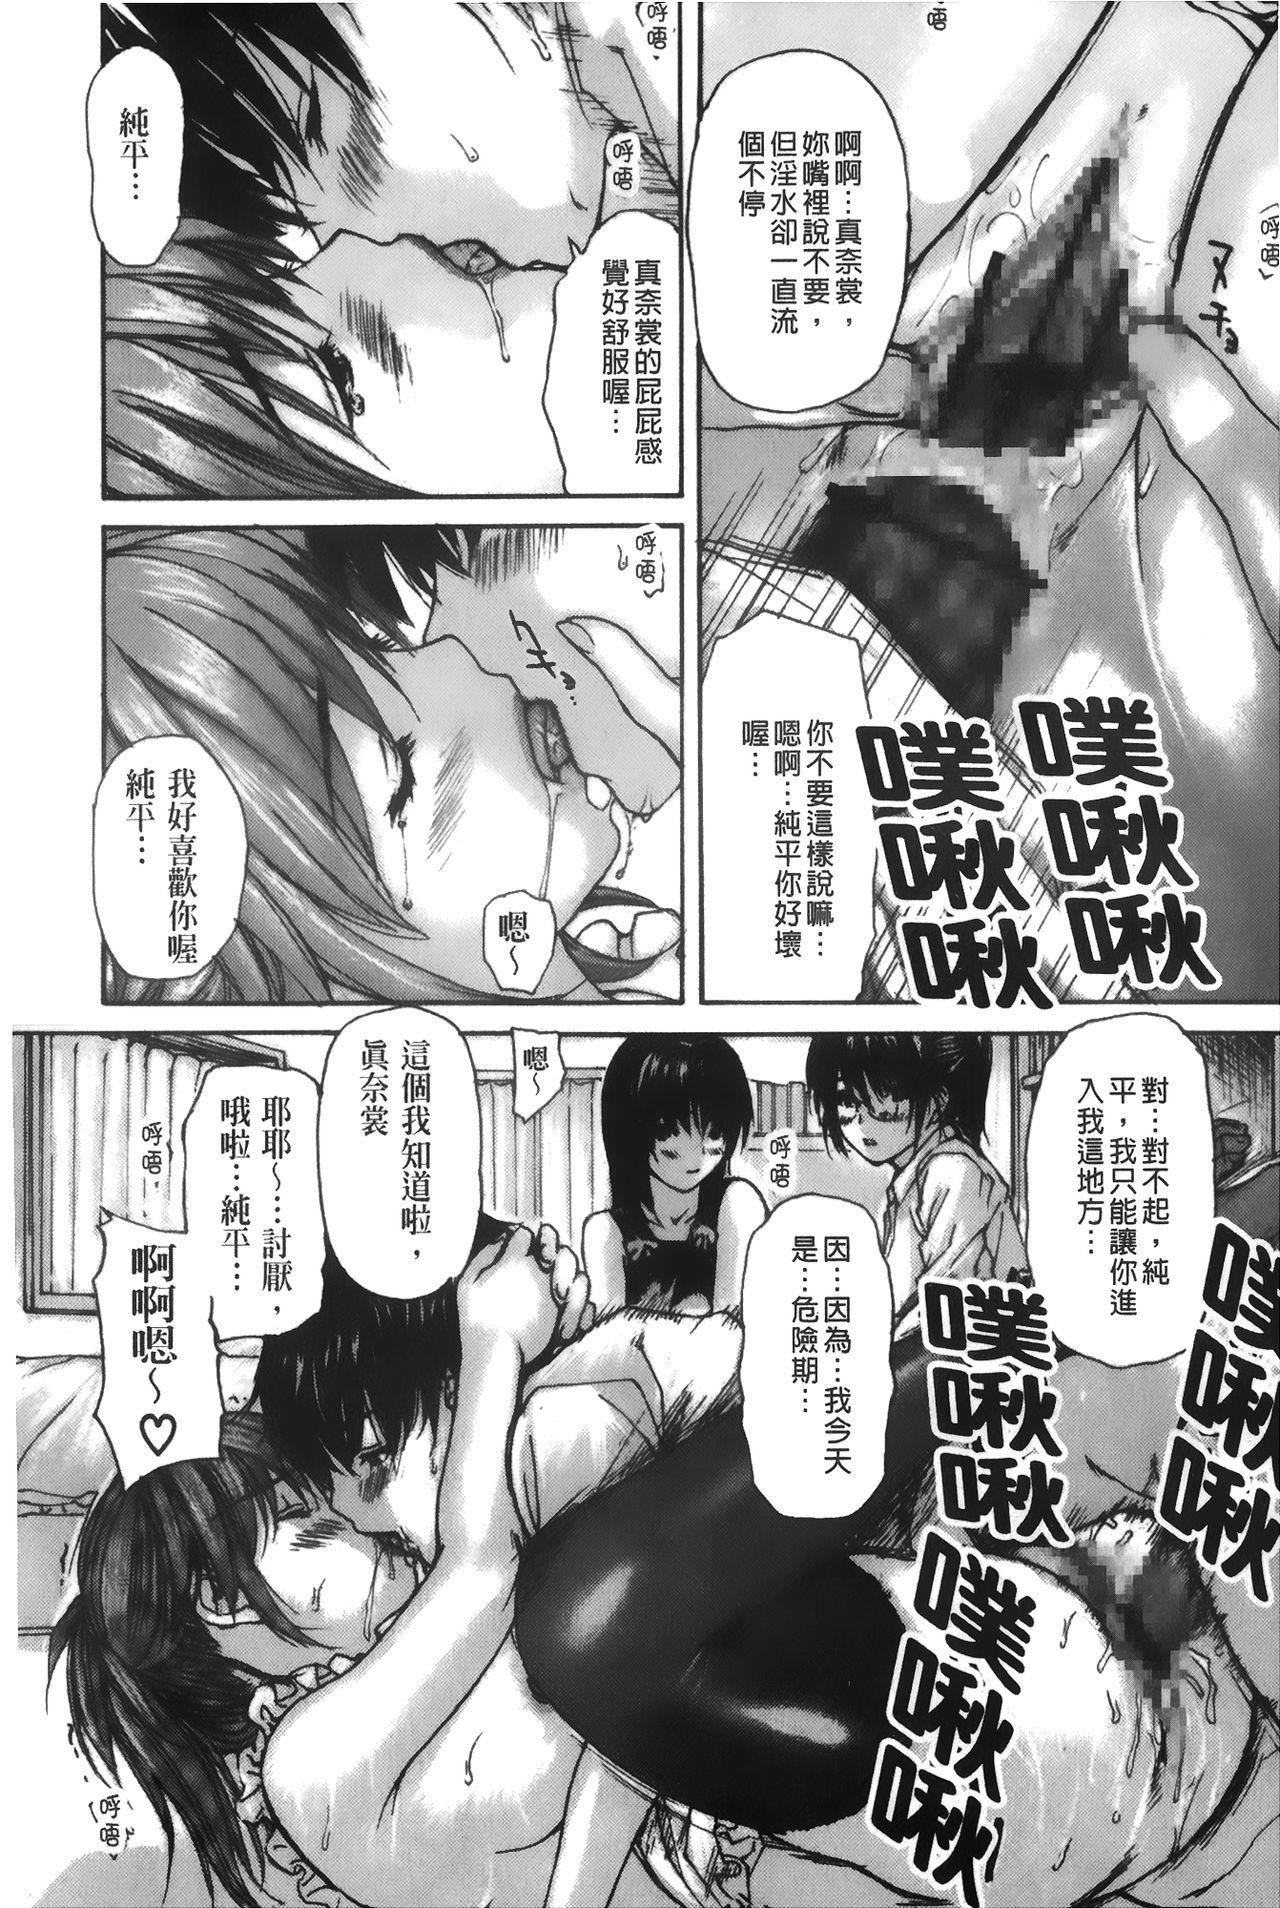 Tonari no Minano Sensei 4 | 隔壁的美奈乃老師 4 45